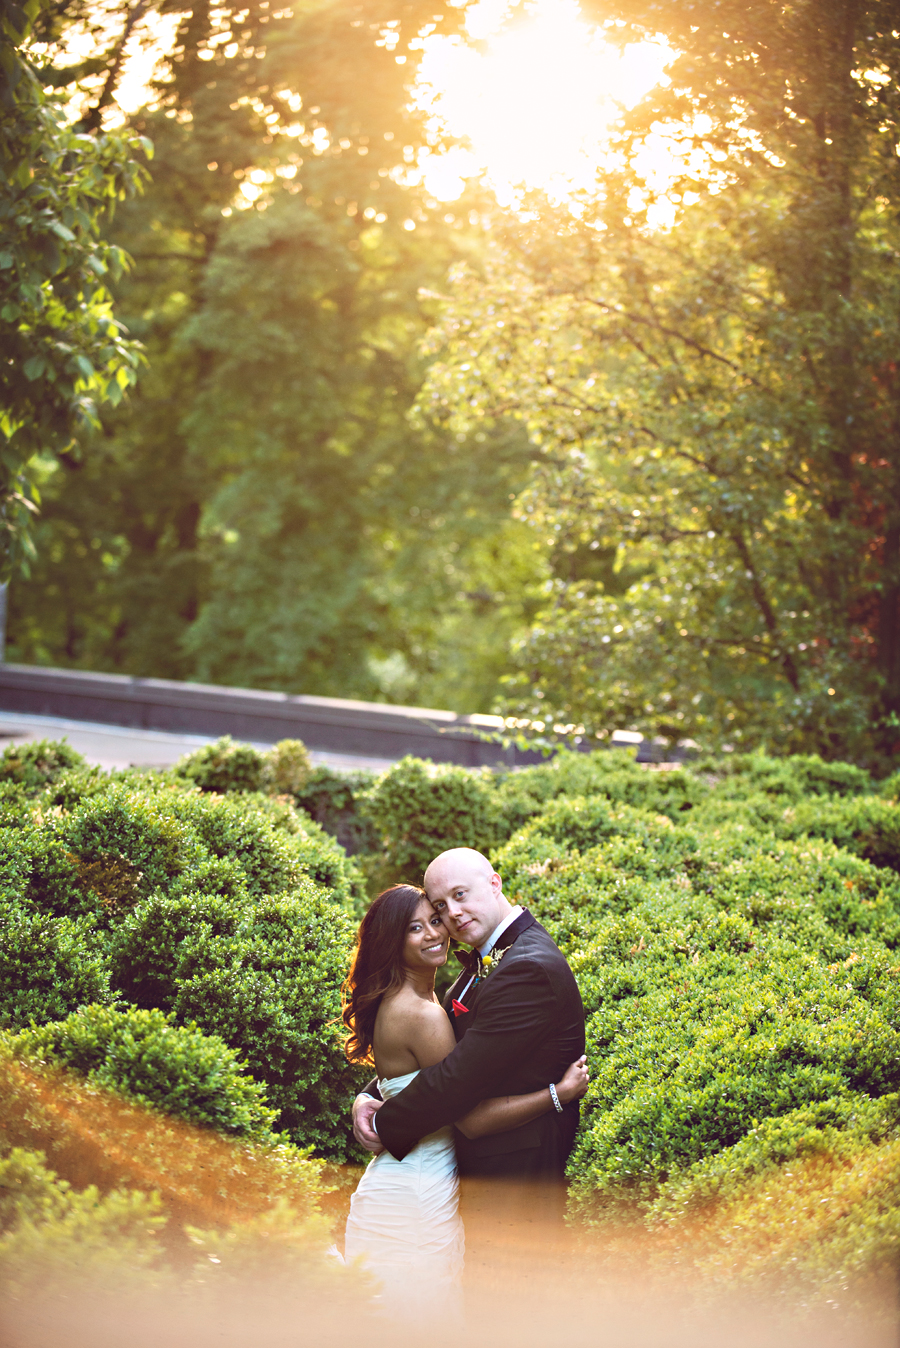 sunlit-garden-maze-wedding-portrait.jpg